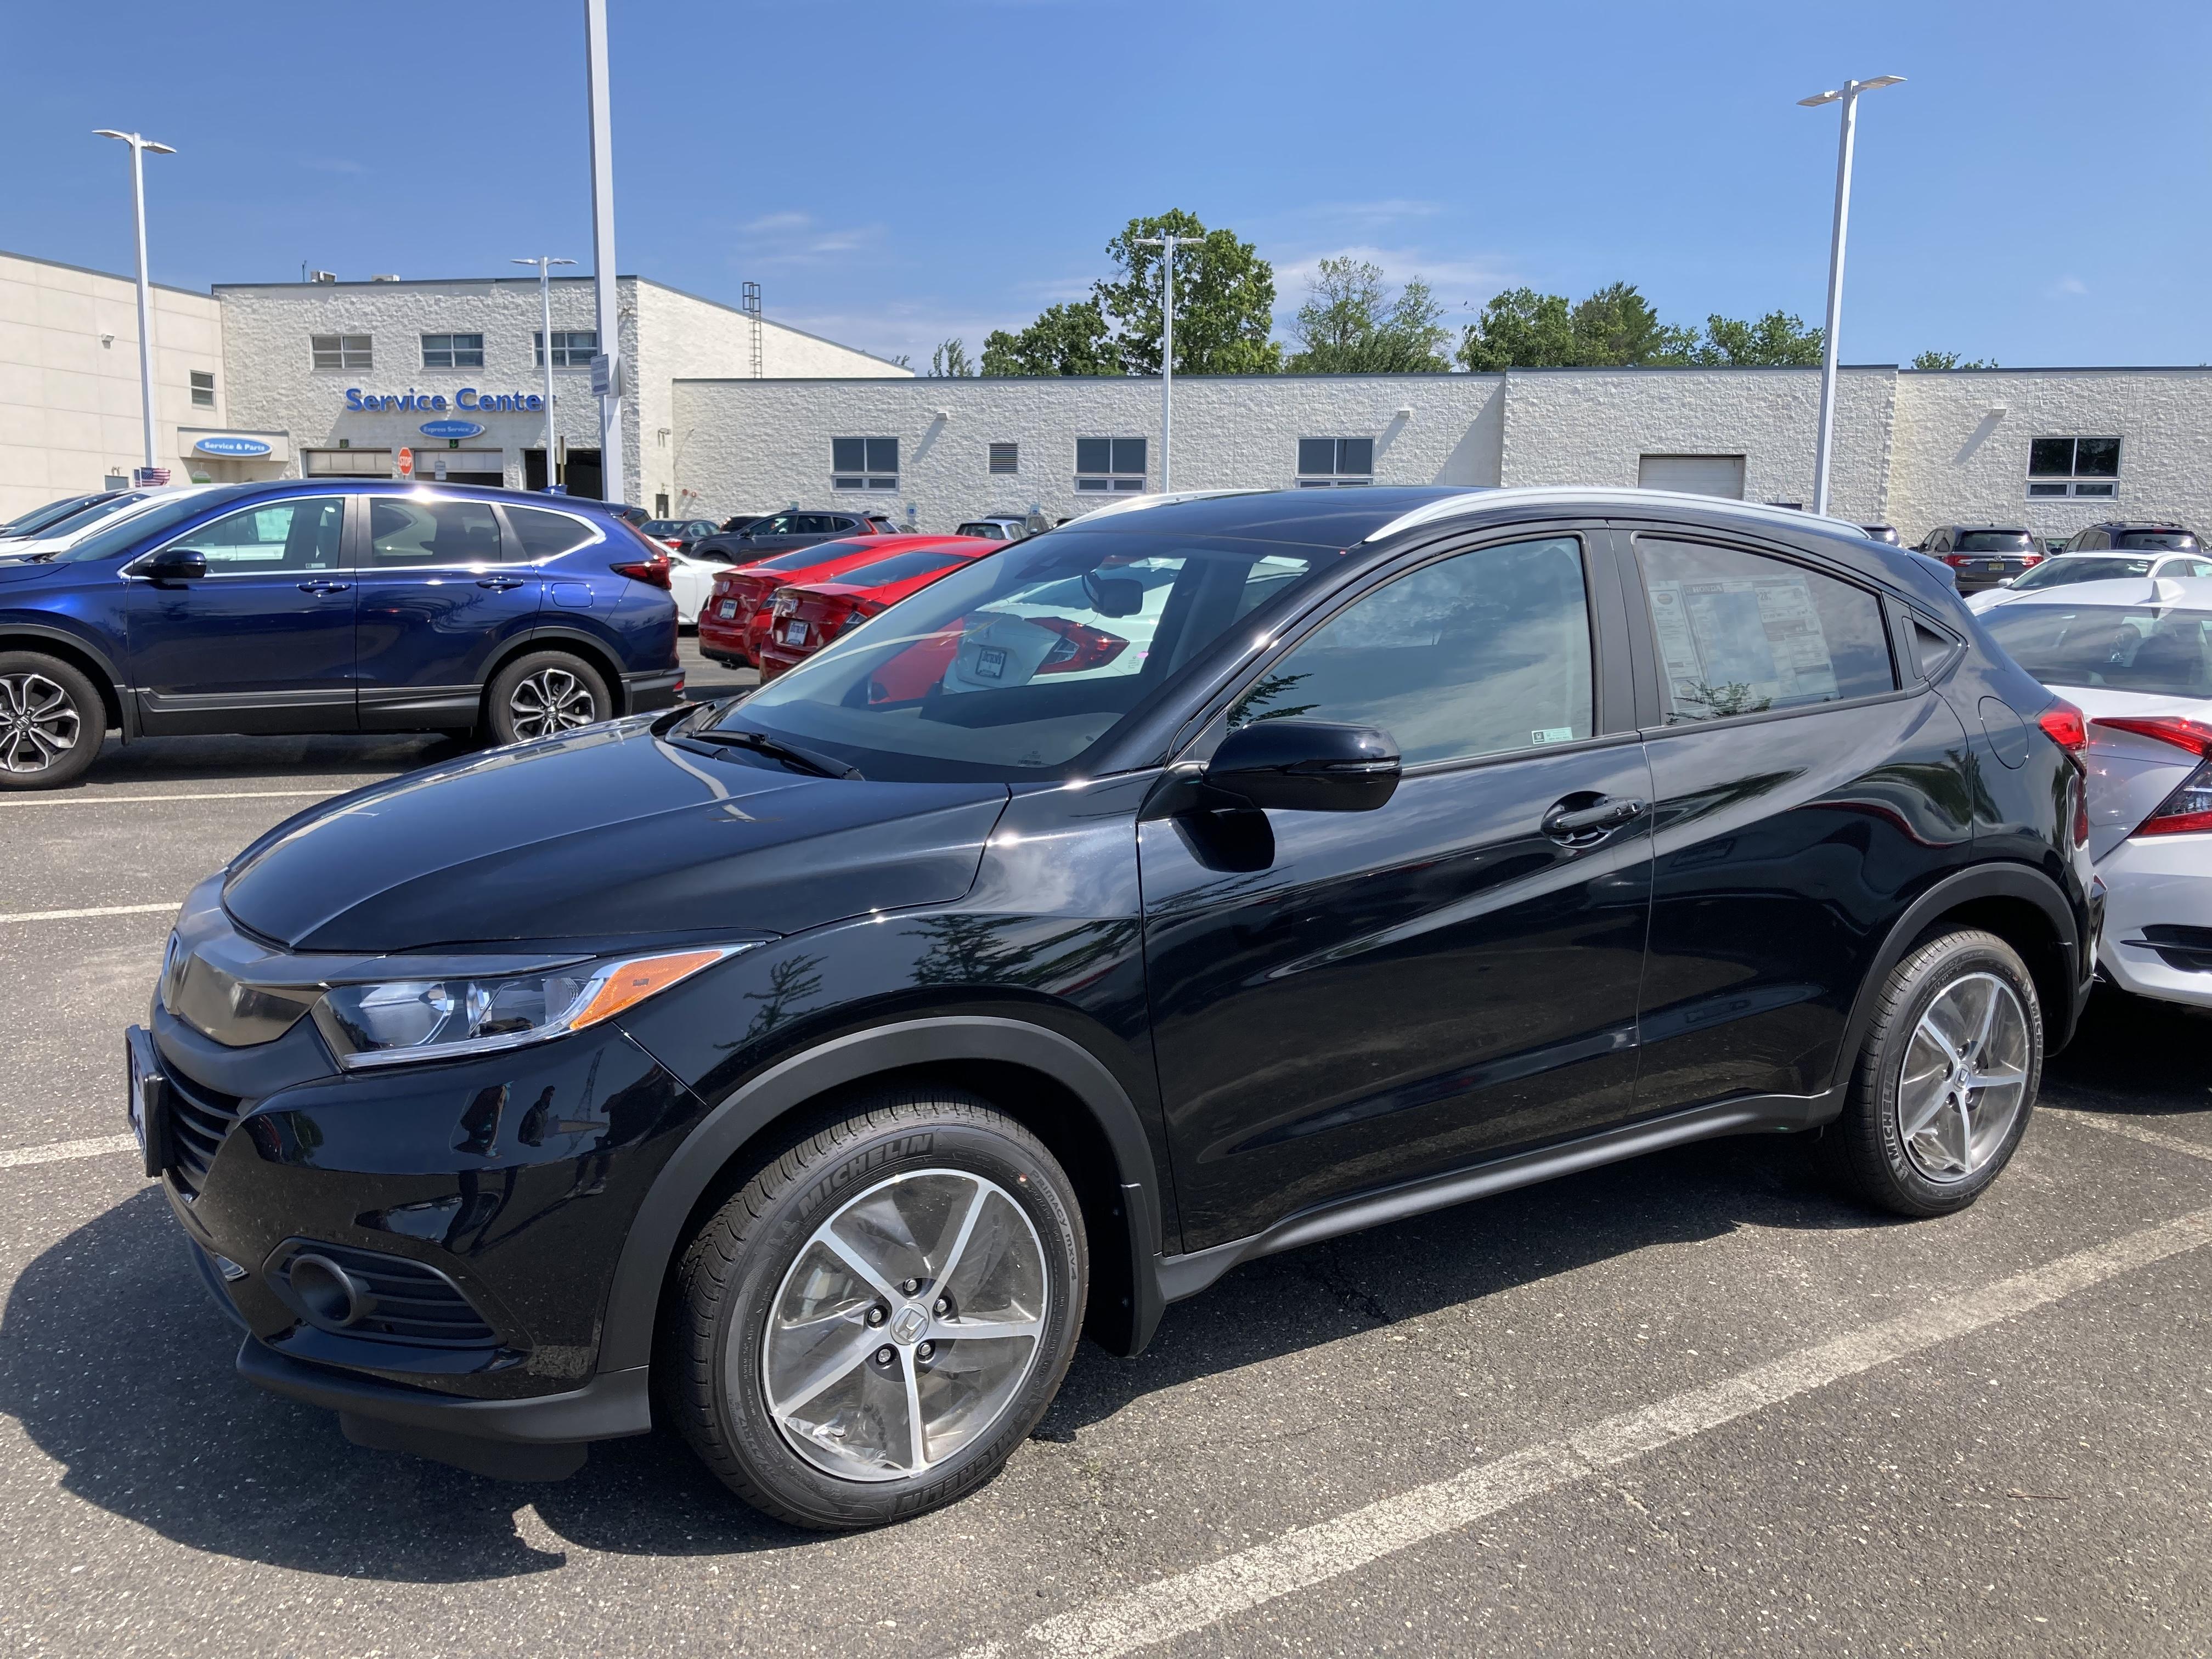 Black Honda HR-V on dealership lot.